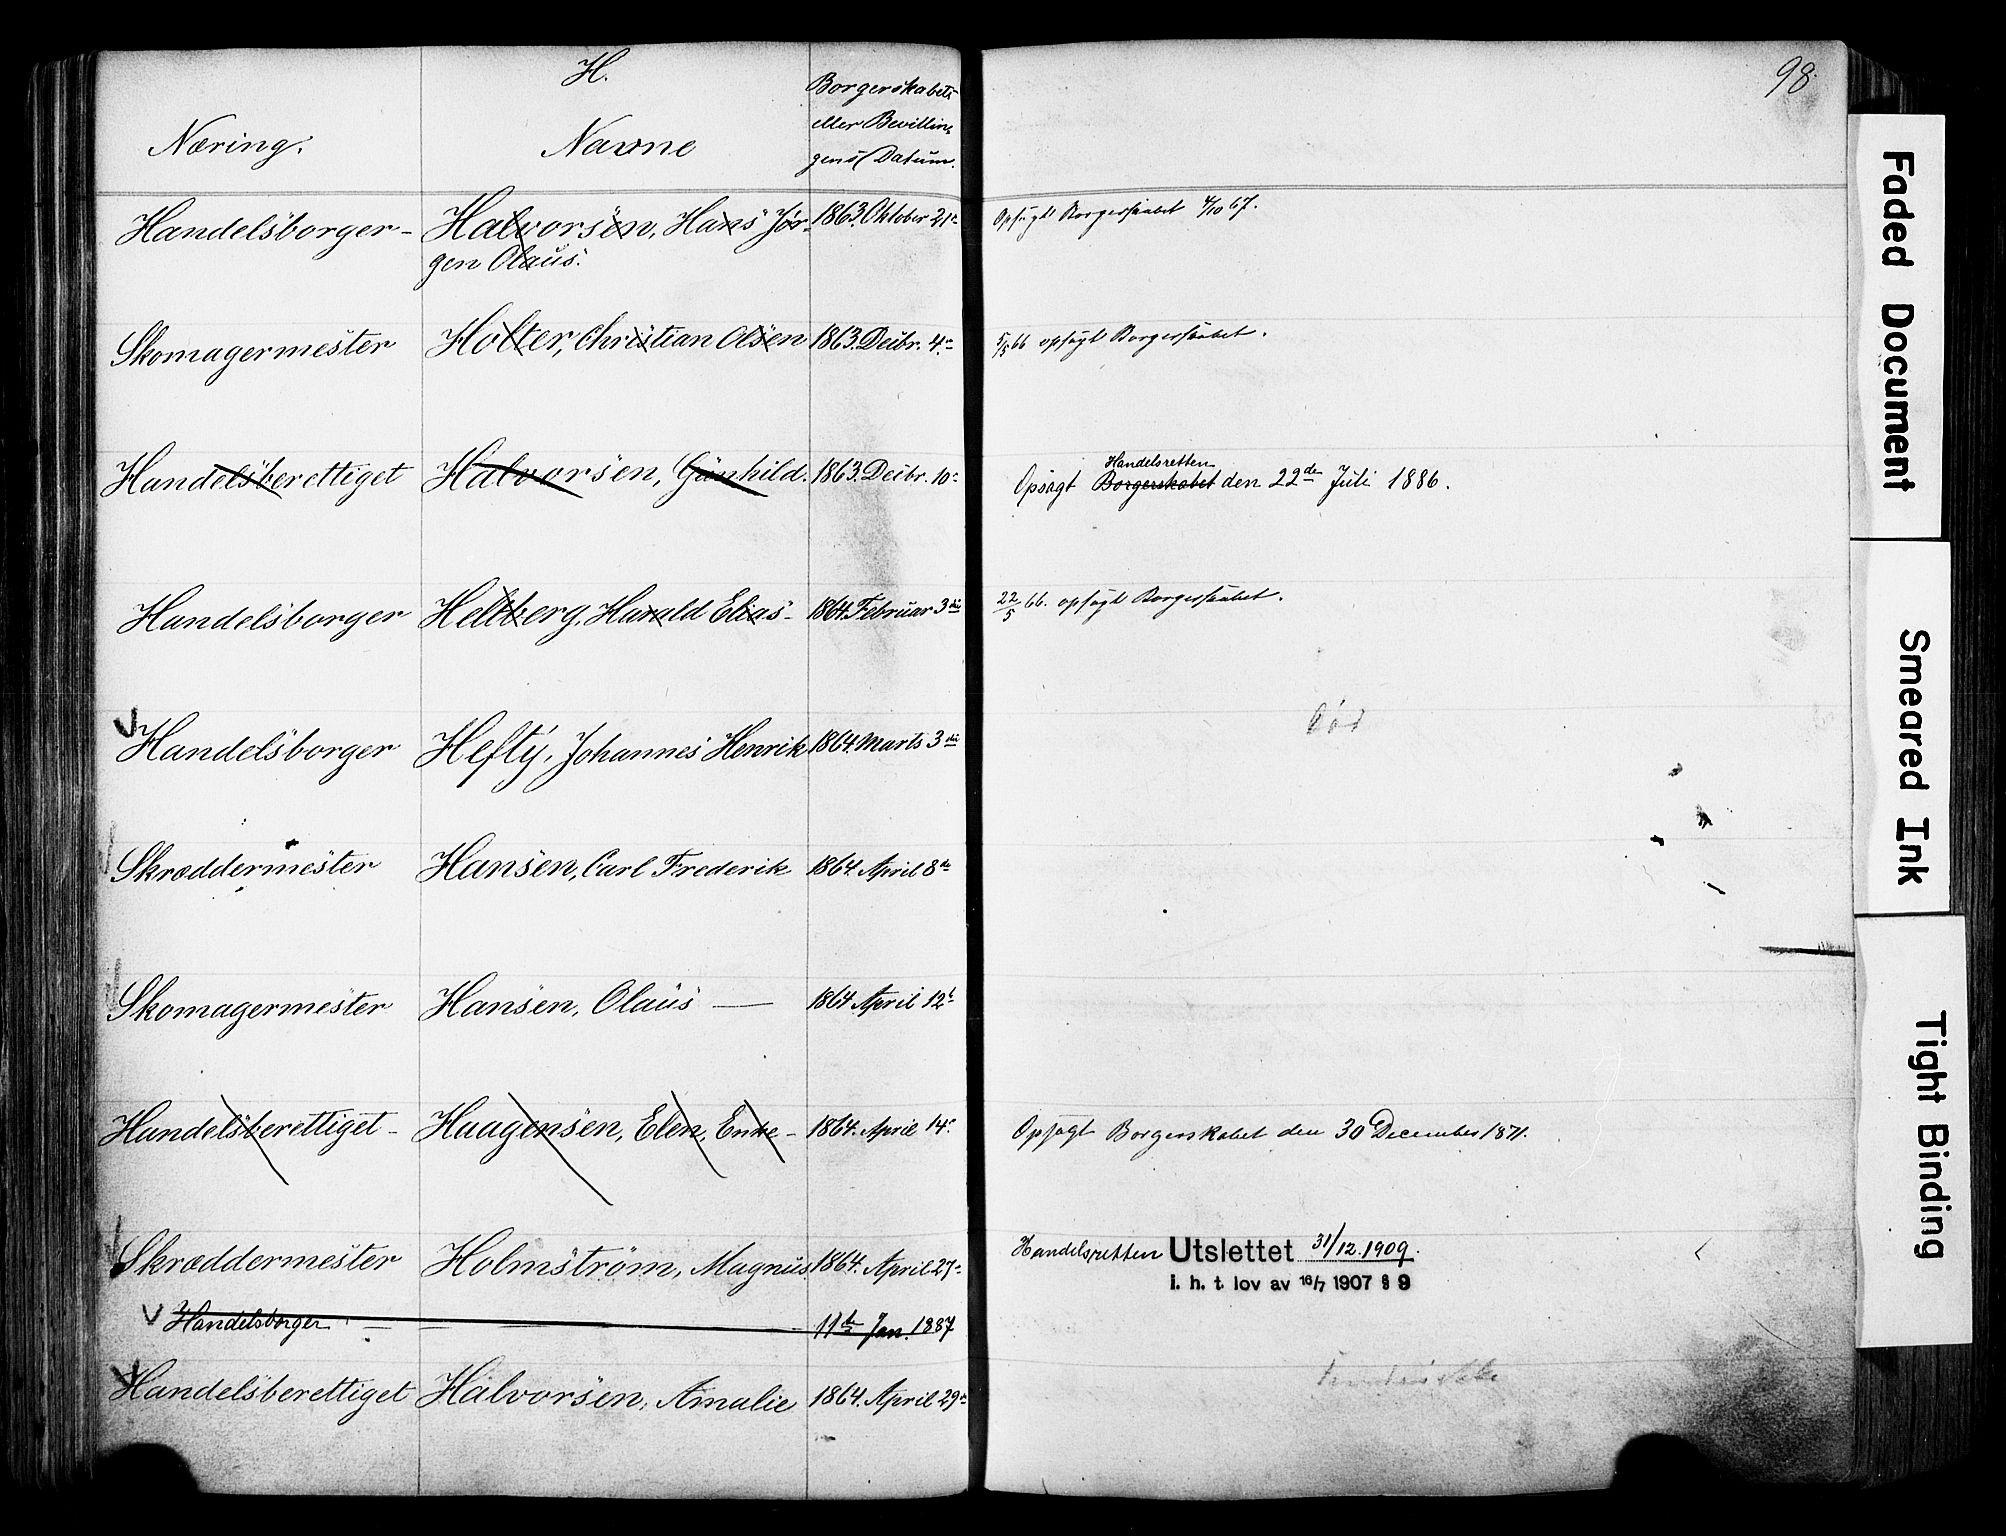 SAO, Kristiania magistrat, F/Fb/L0004: Borgerrulle, 1860-1879, s. 100